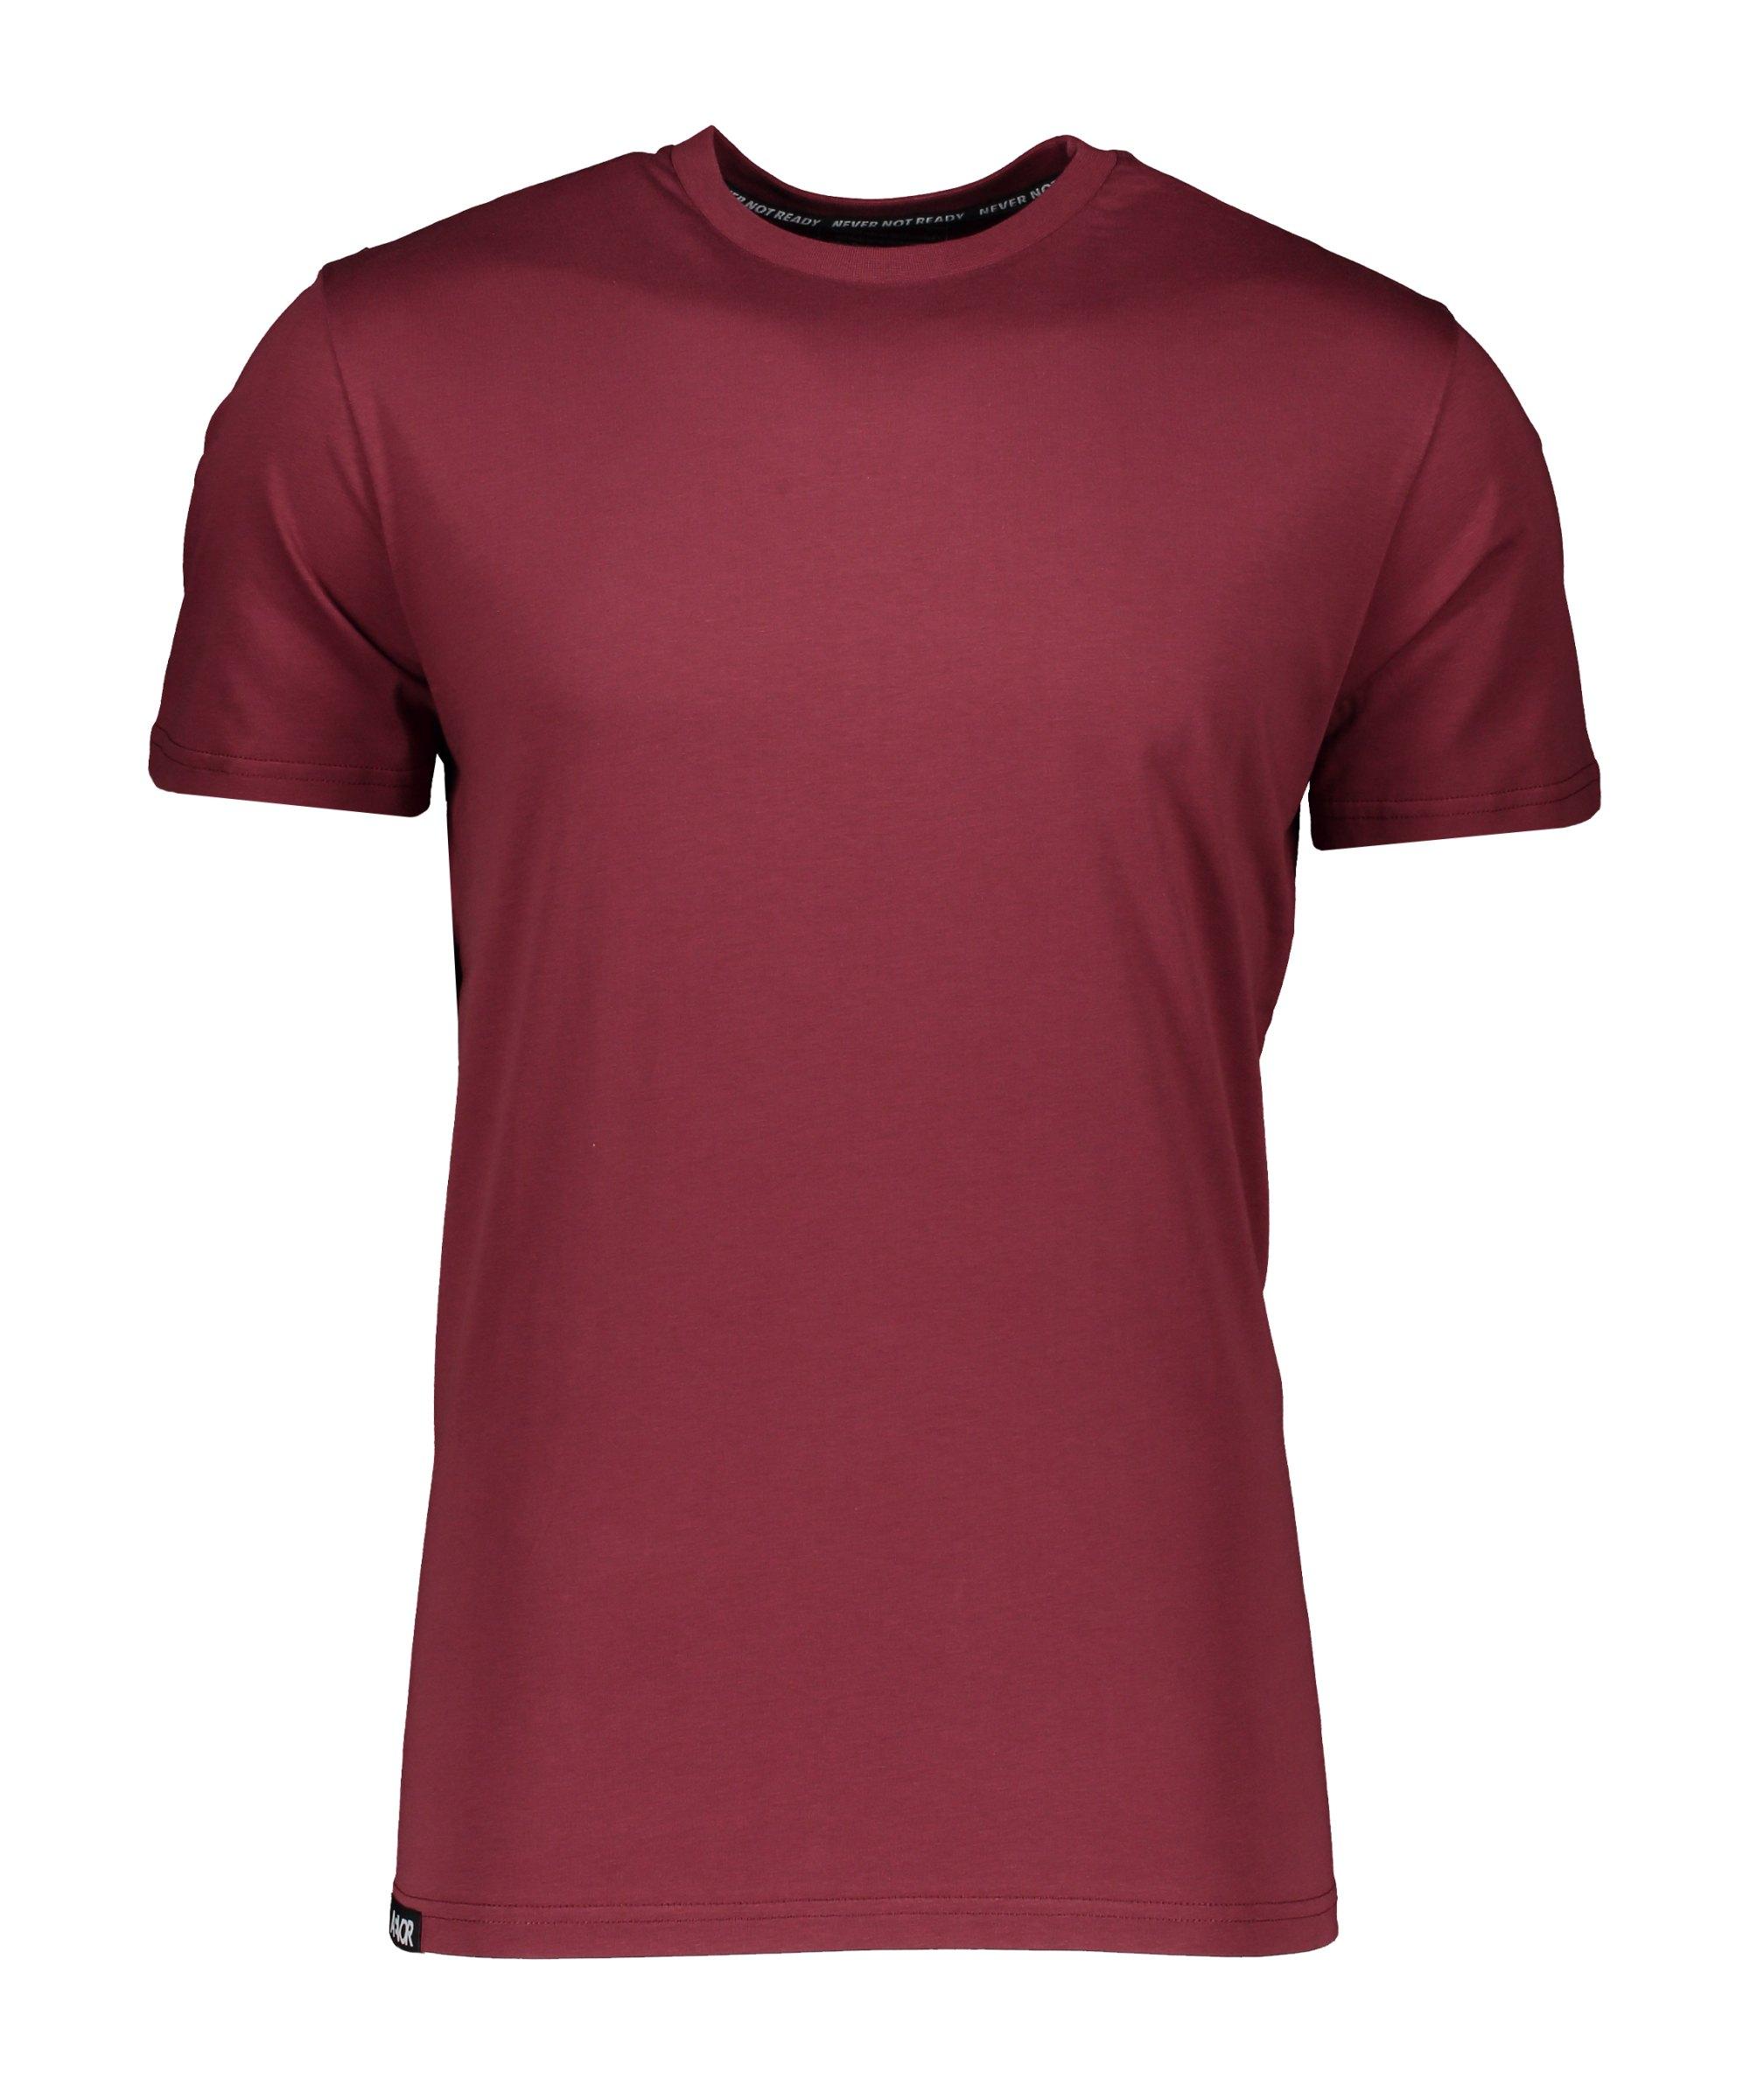 AEVOR Base Tee T-Shirt Rot F50077 - rot